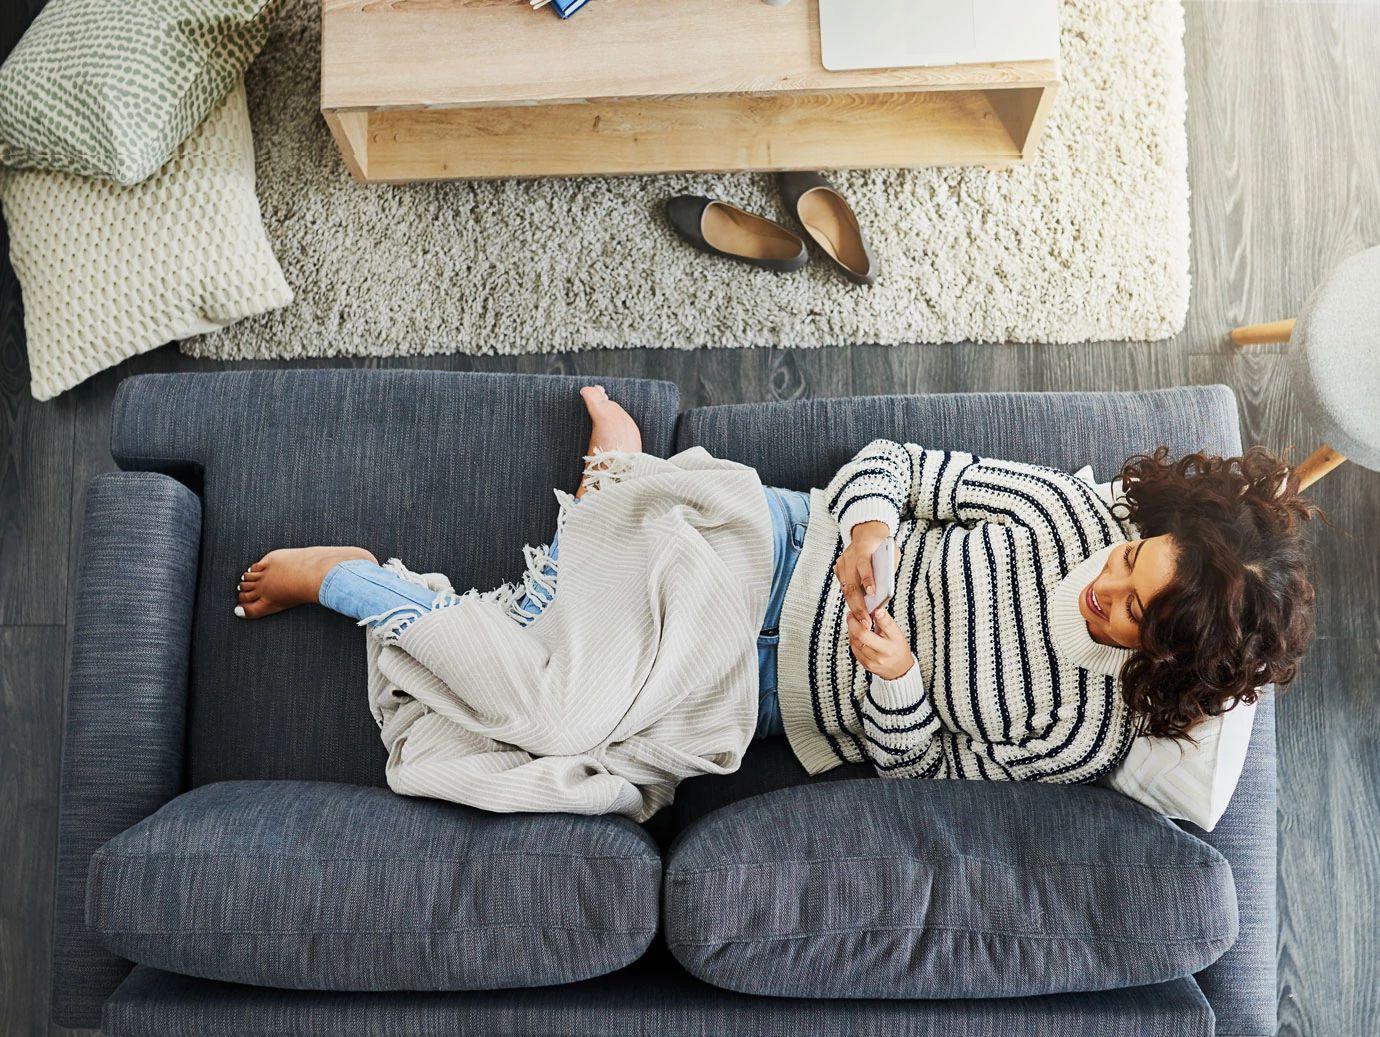 Flexible, Comfortable, Individualized Temperature Control